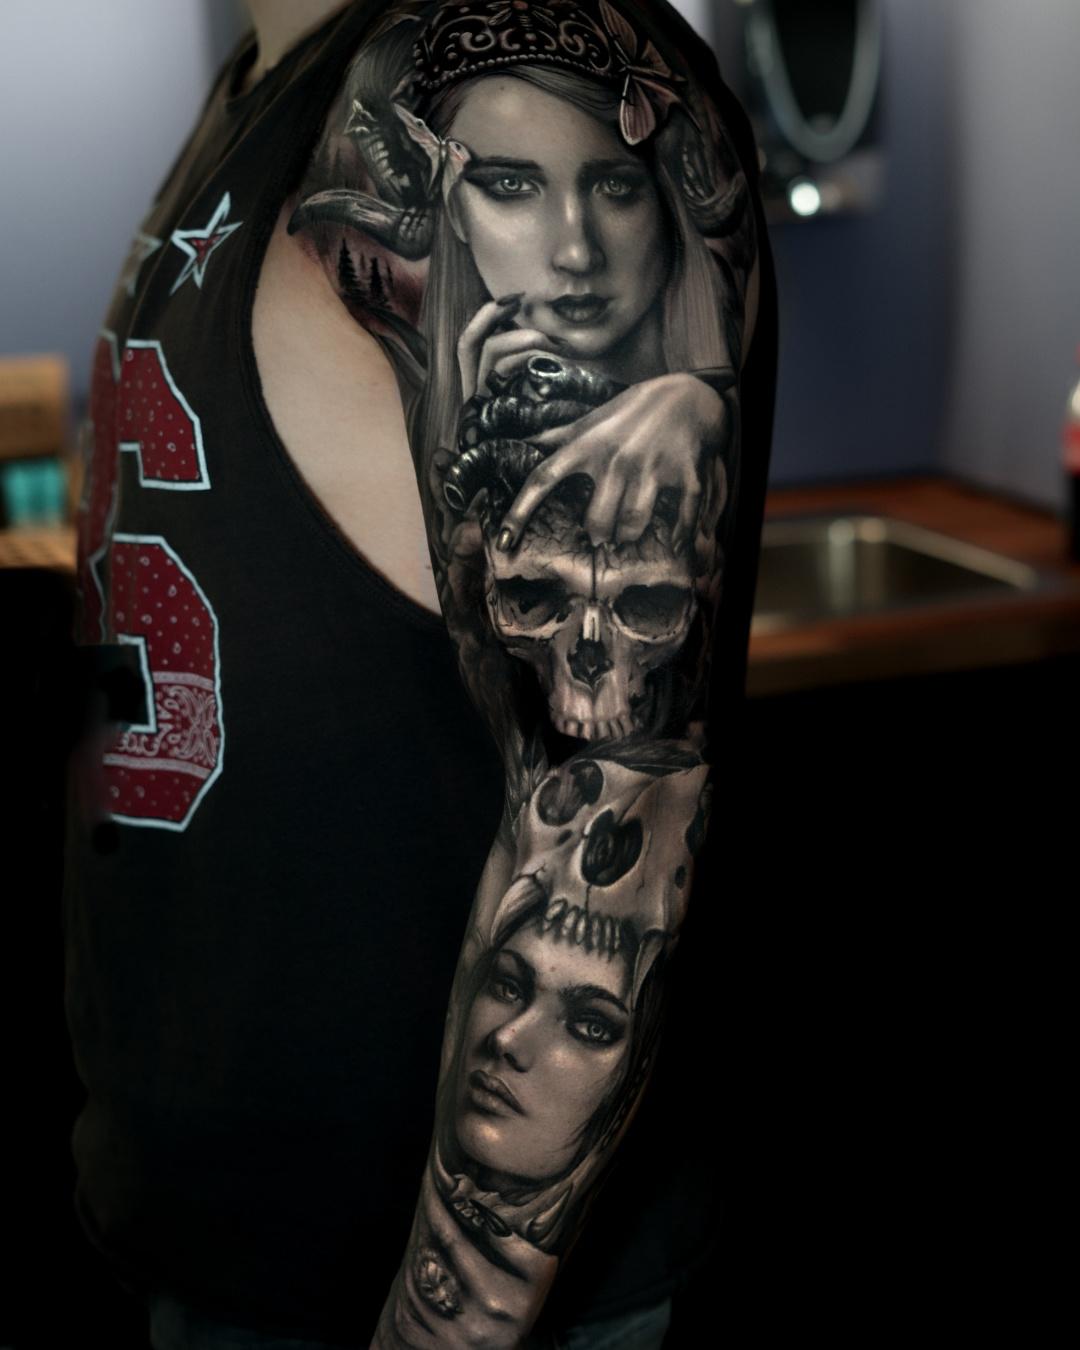 Tattoo tatuaje Alexis Epalza black and grey realistic girl sleeve animal face portrait